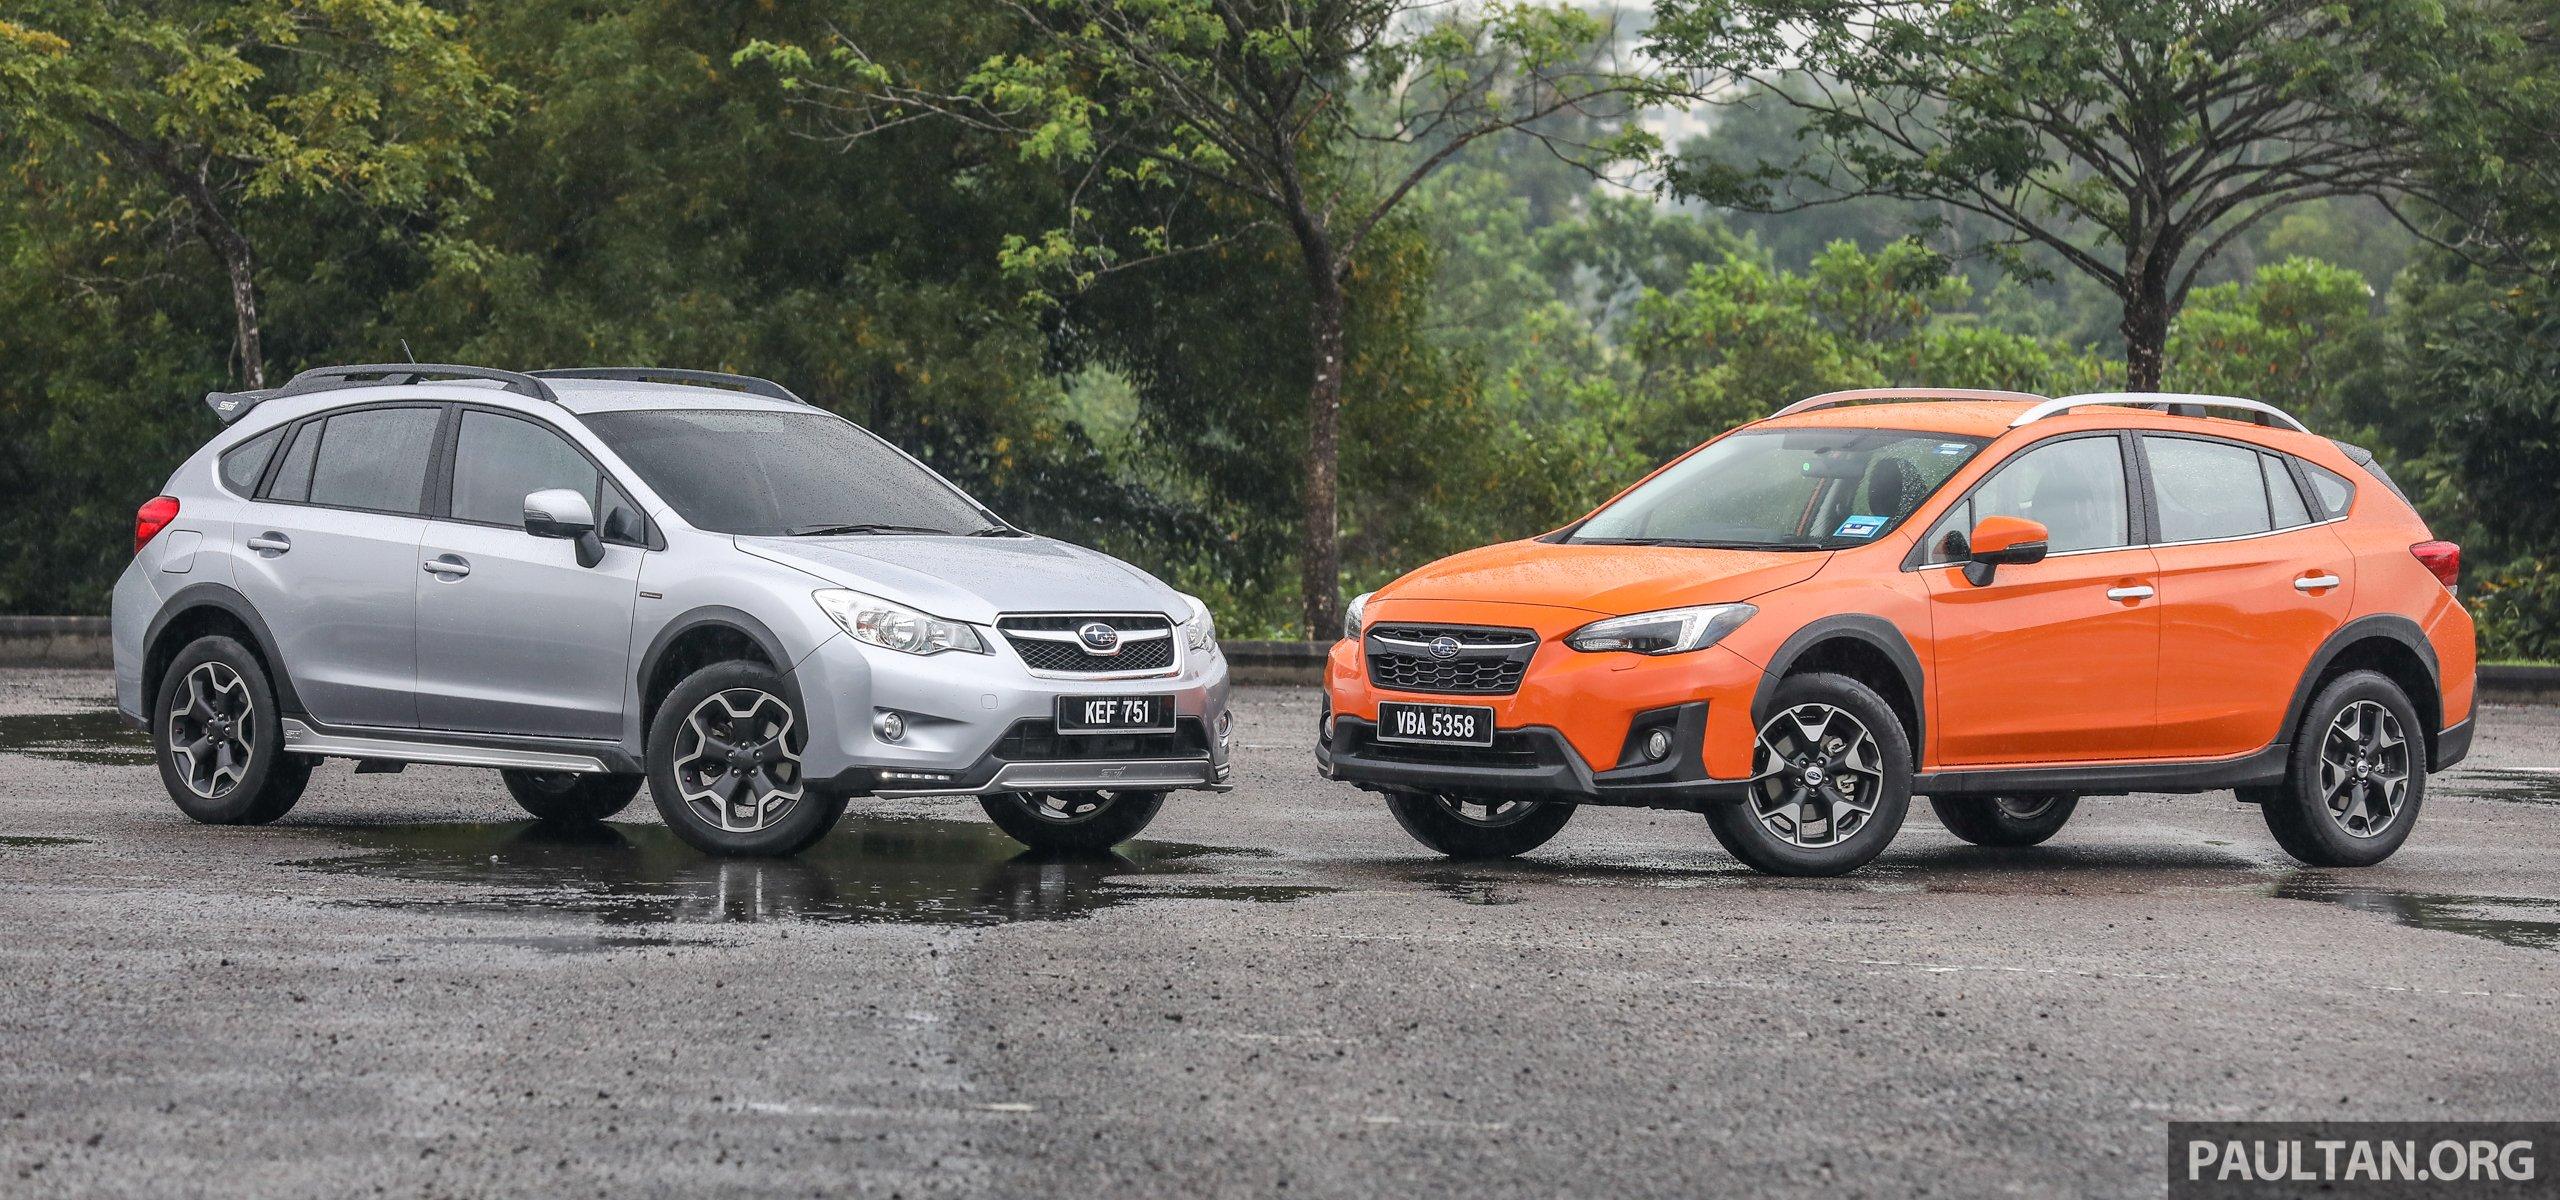 Subaru xv sti malaysia – Tag – Auto Breaking News